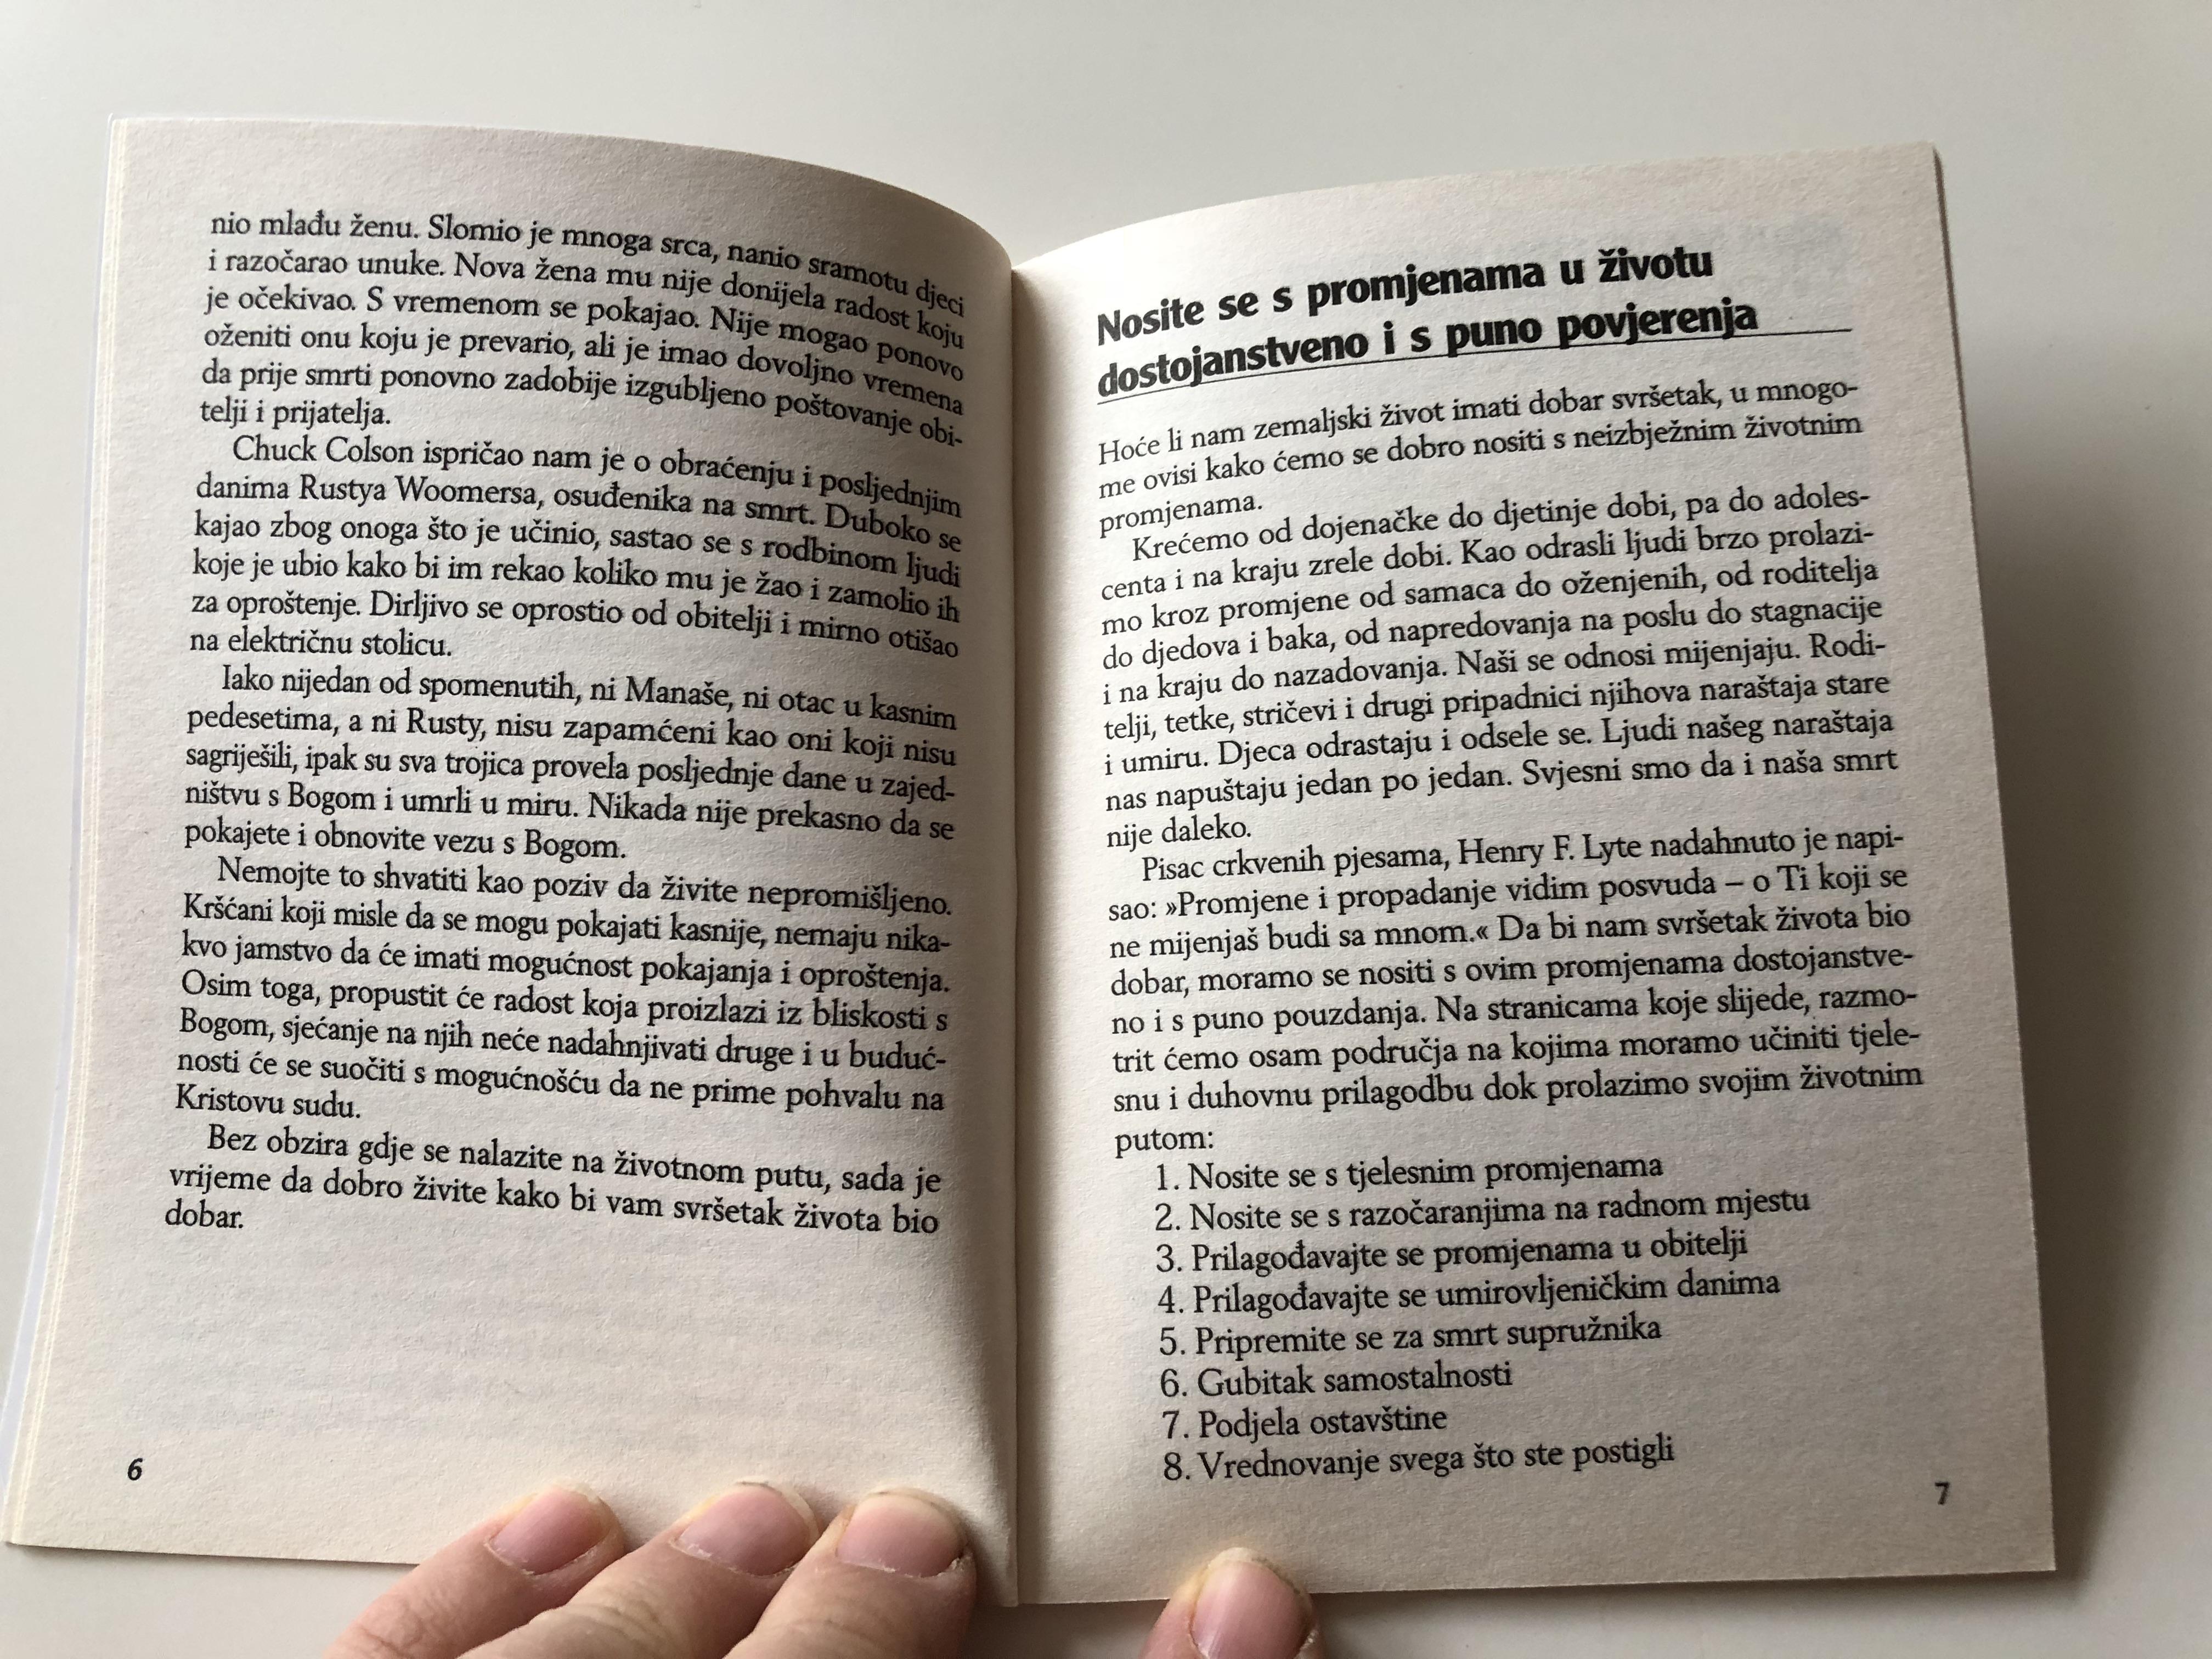 dobar-svr-etak-croatian-language-booklet-finishing-well-herb-vander-lugt-paperback-2003-3-.jpg